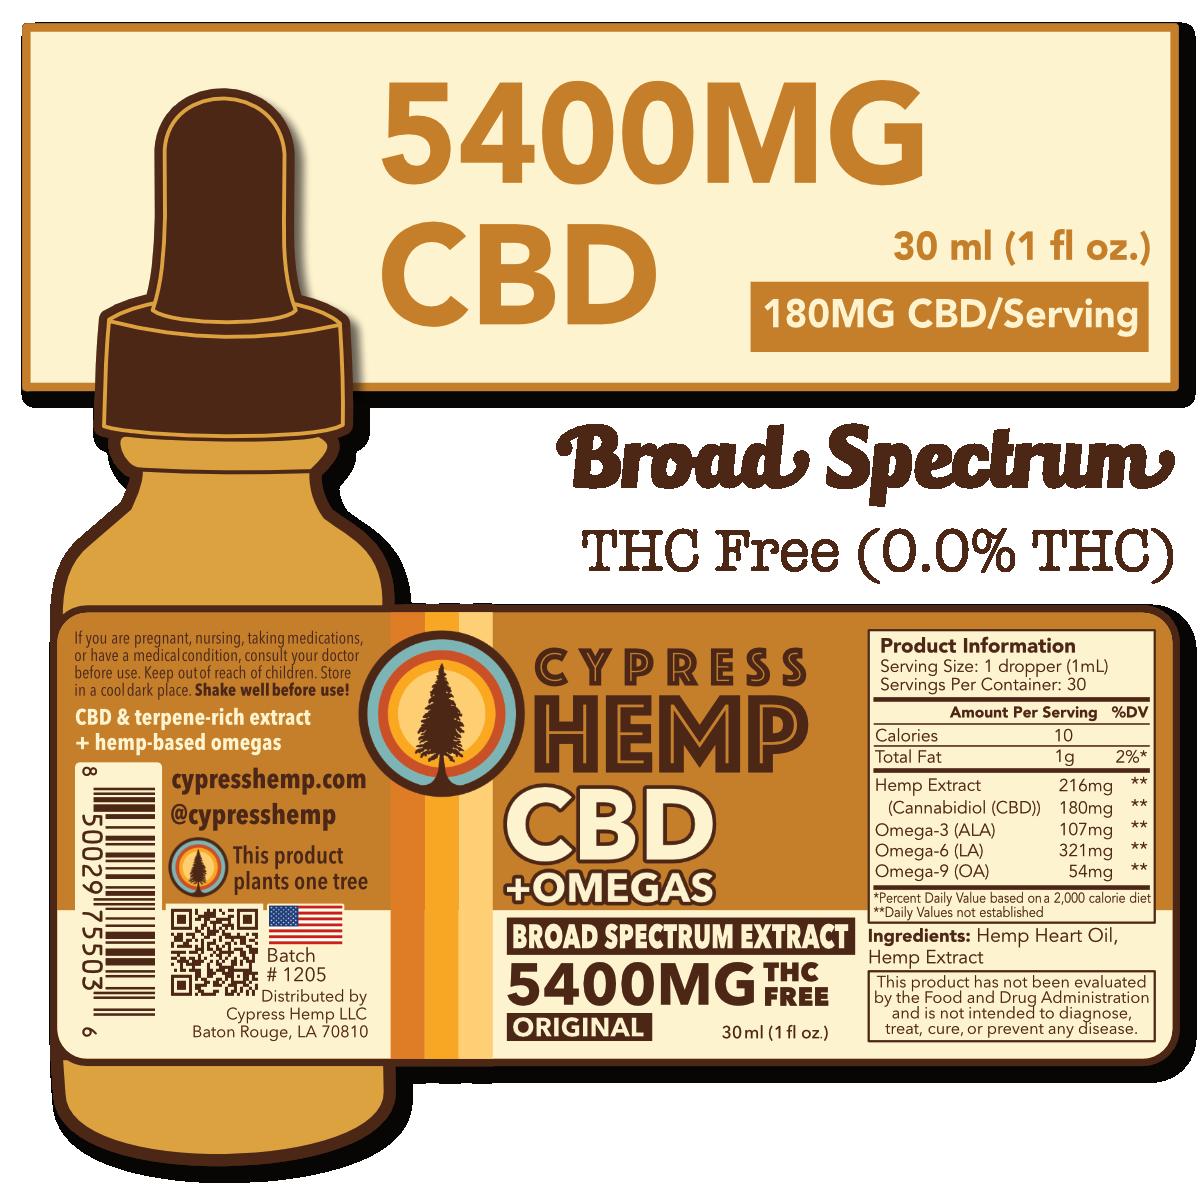 Cypress Hemp Cypress Hemp Broad Spectrum  CBD + OMEGAS™ Oil Original 5400mg CBD